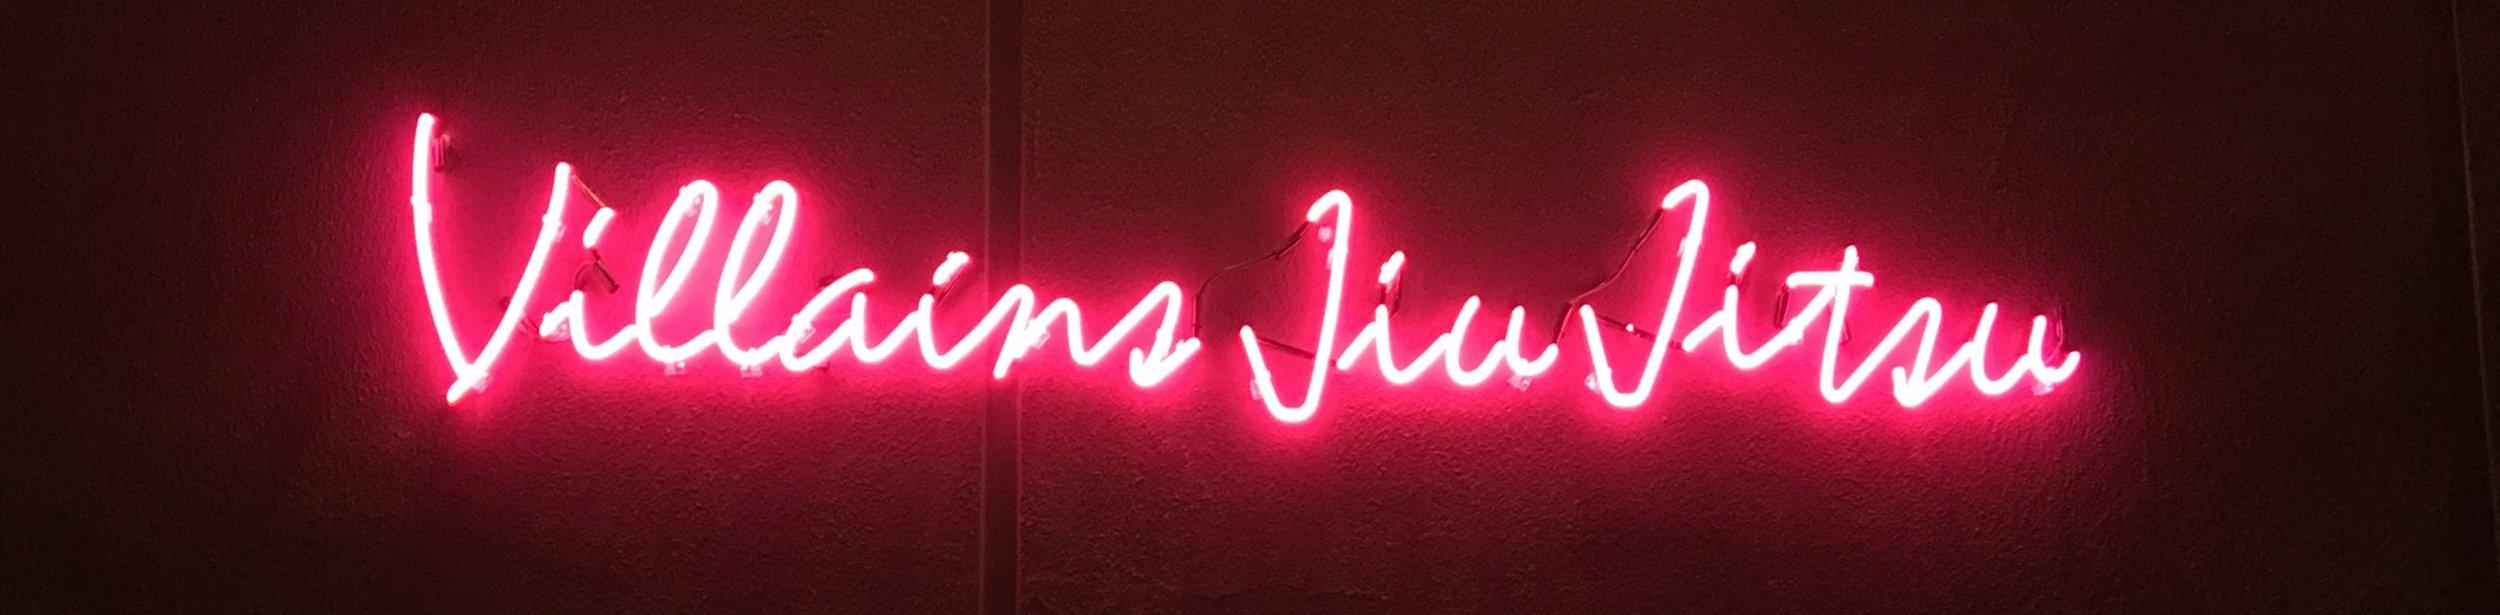 VJJJ Neon Sign Pic.jpg